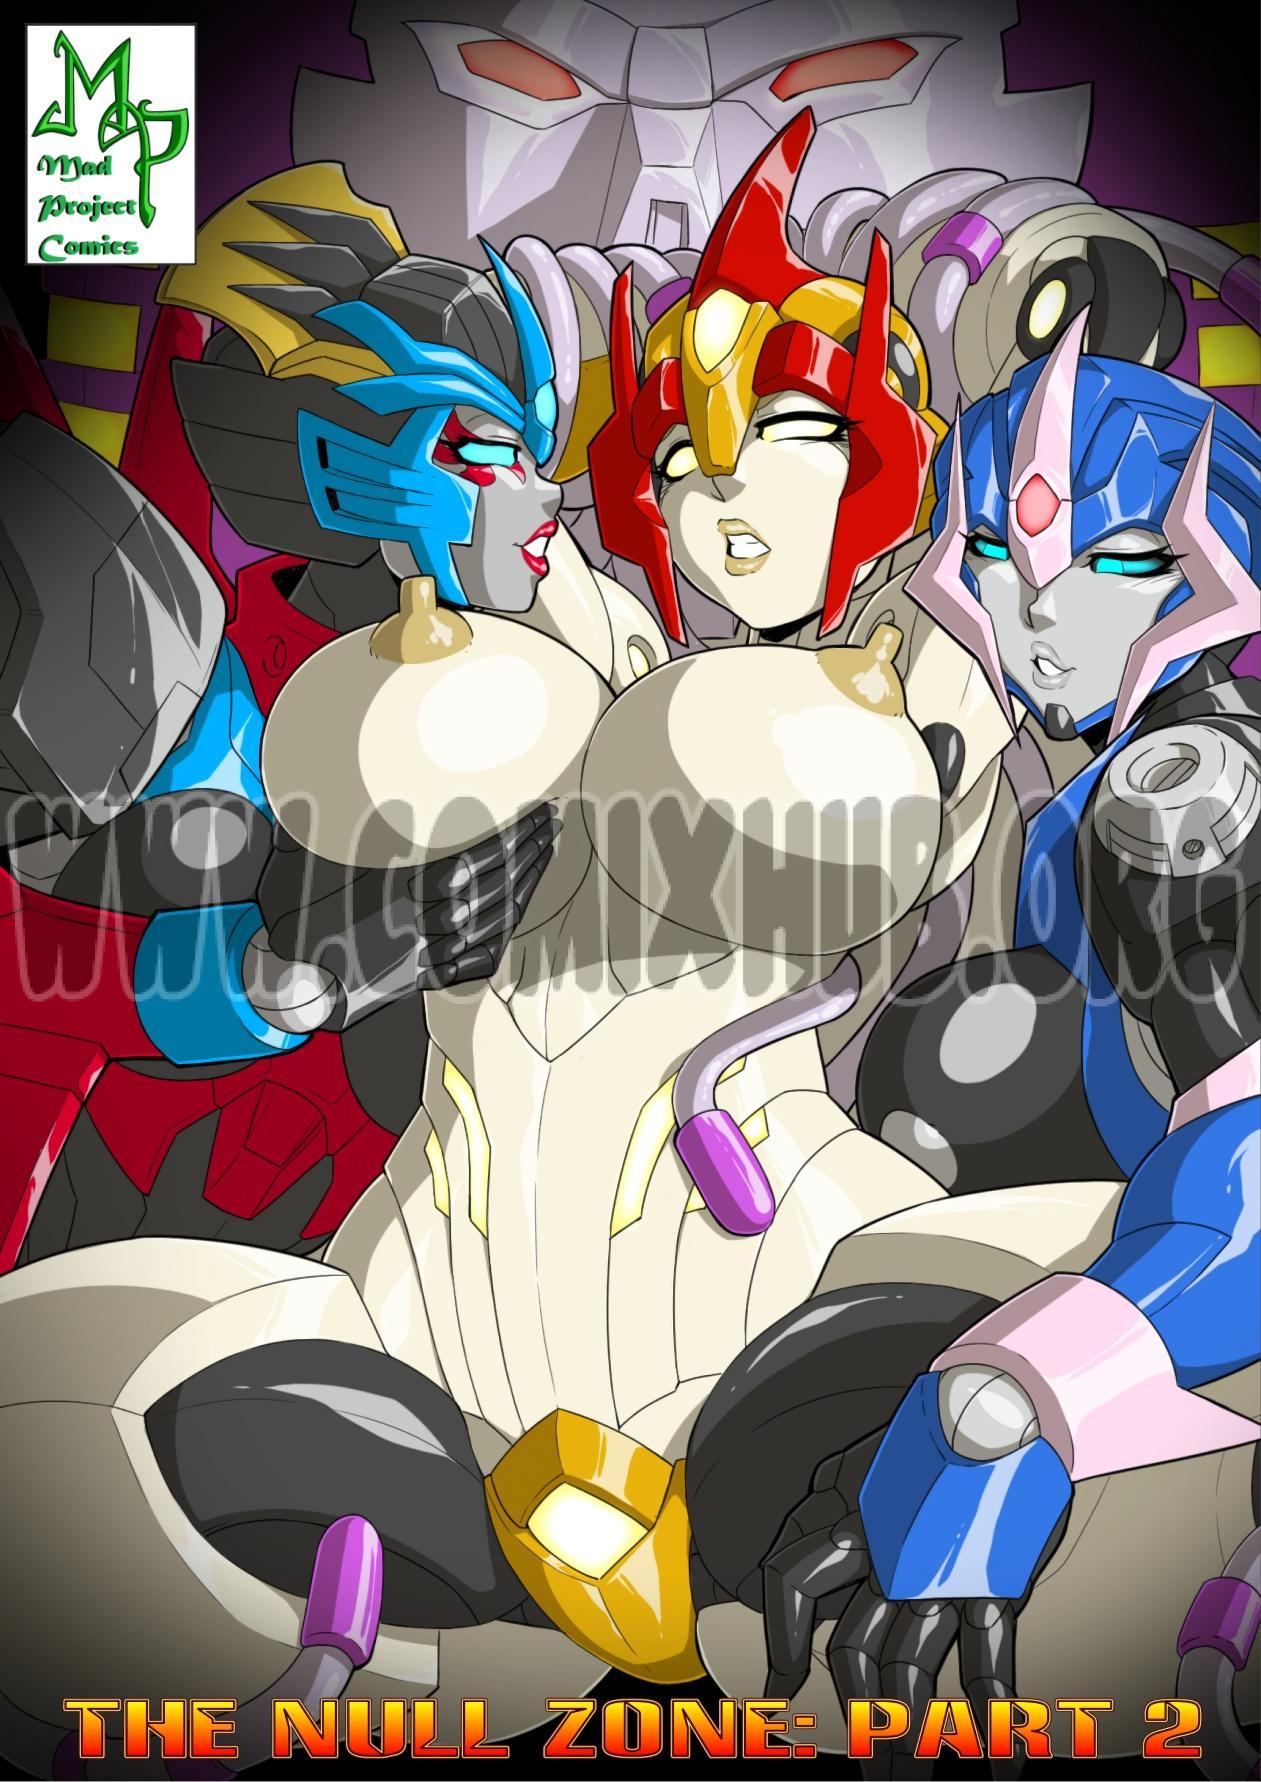 The Null Zone 2 Oral sex, Big Tits, Blowjob, Creampie, Deepthroat, Futanari, Group Sex, Masturbation, Sci-Fi, Straight, Tentacles, Titfuck